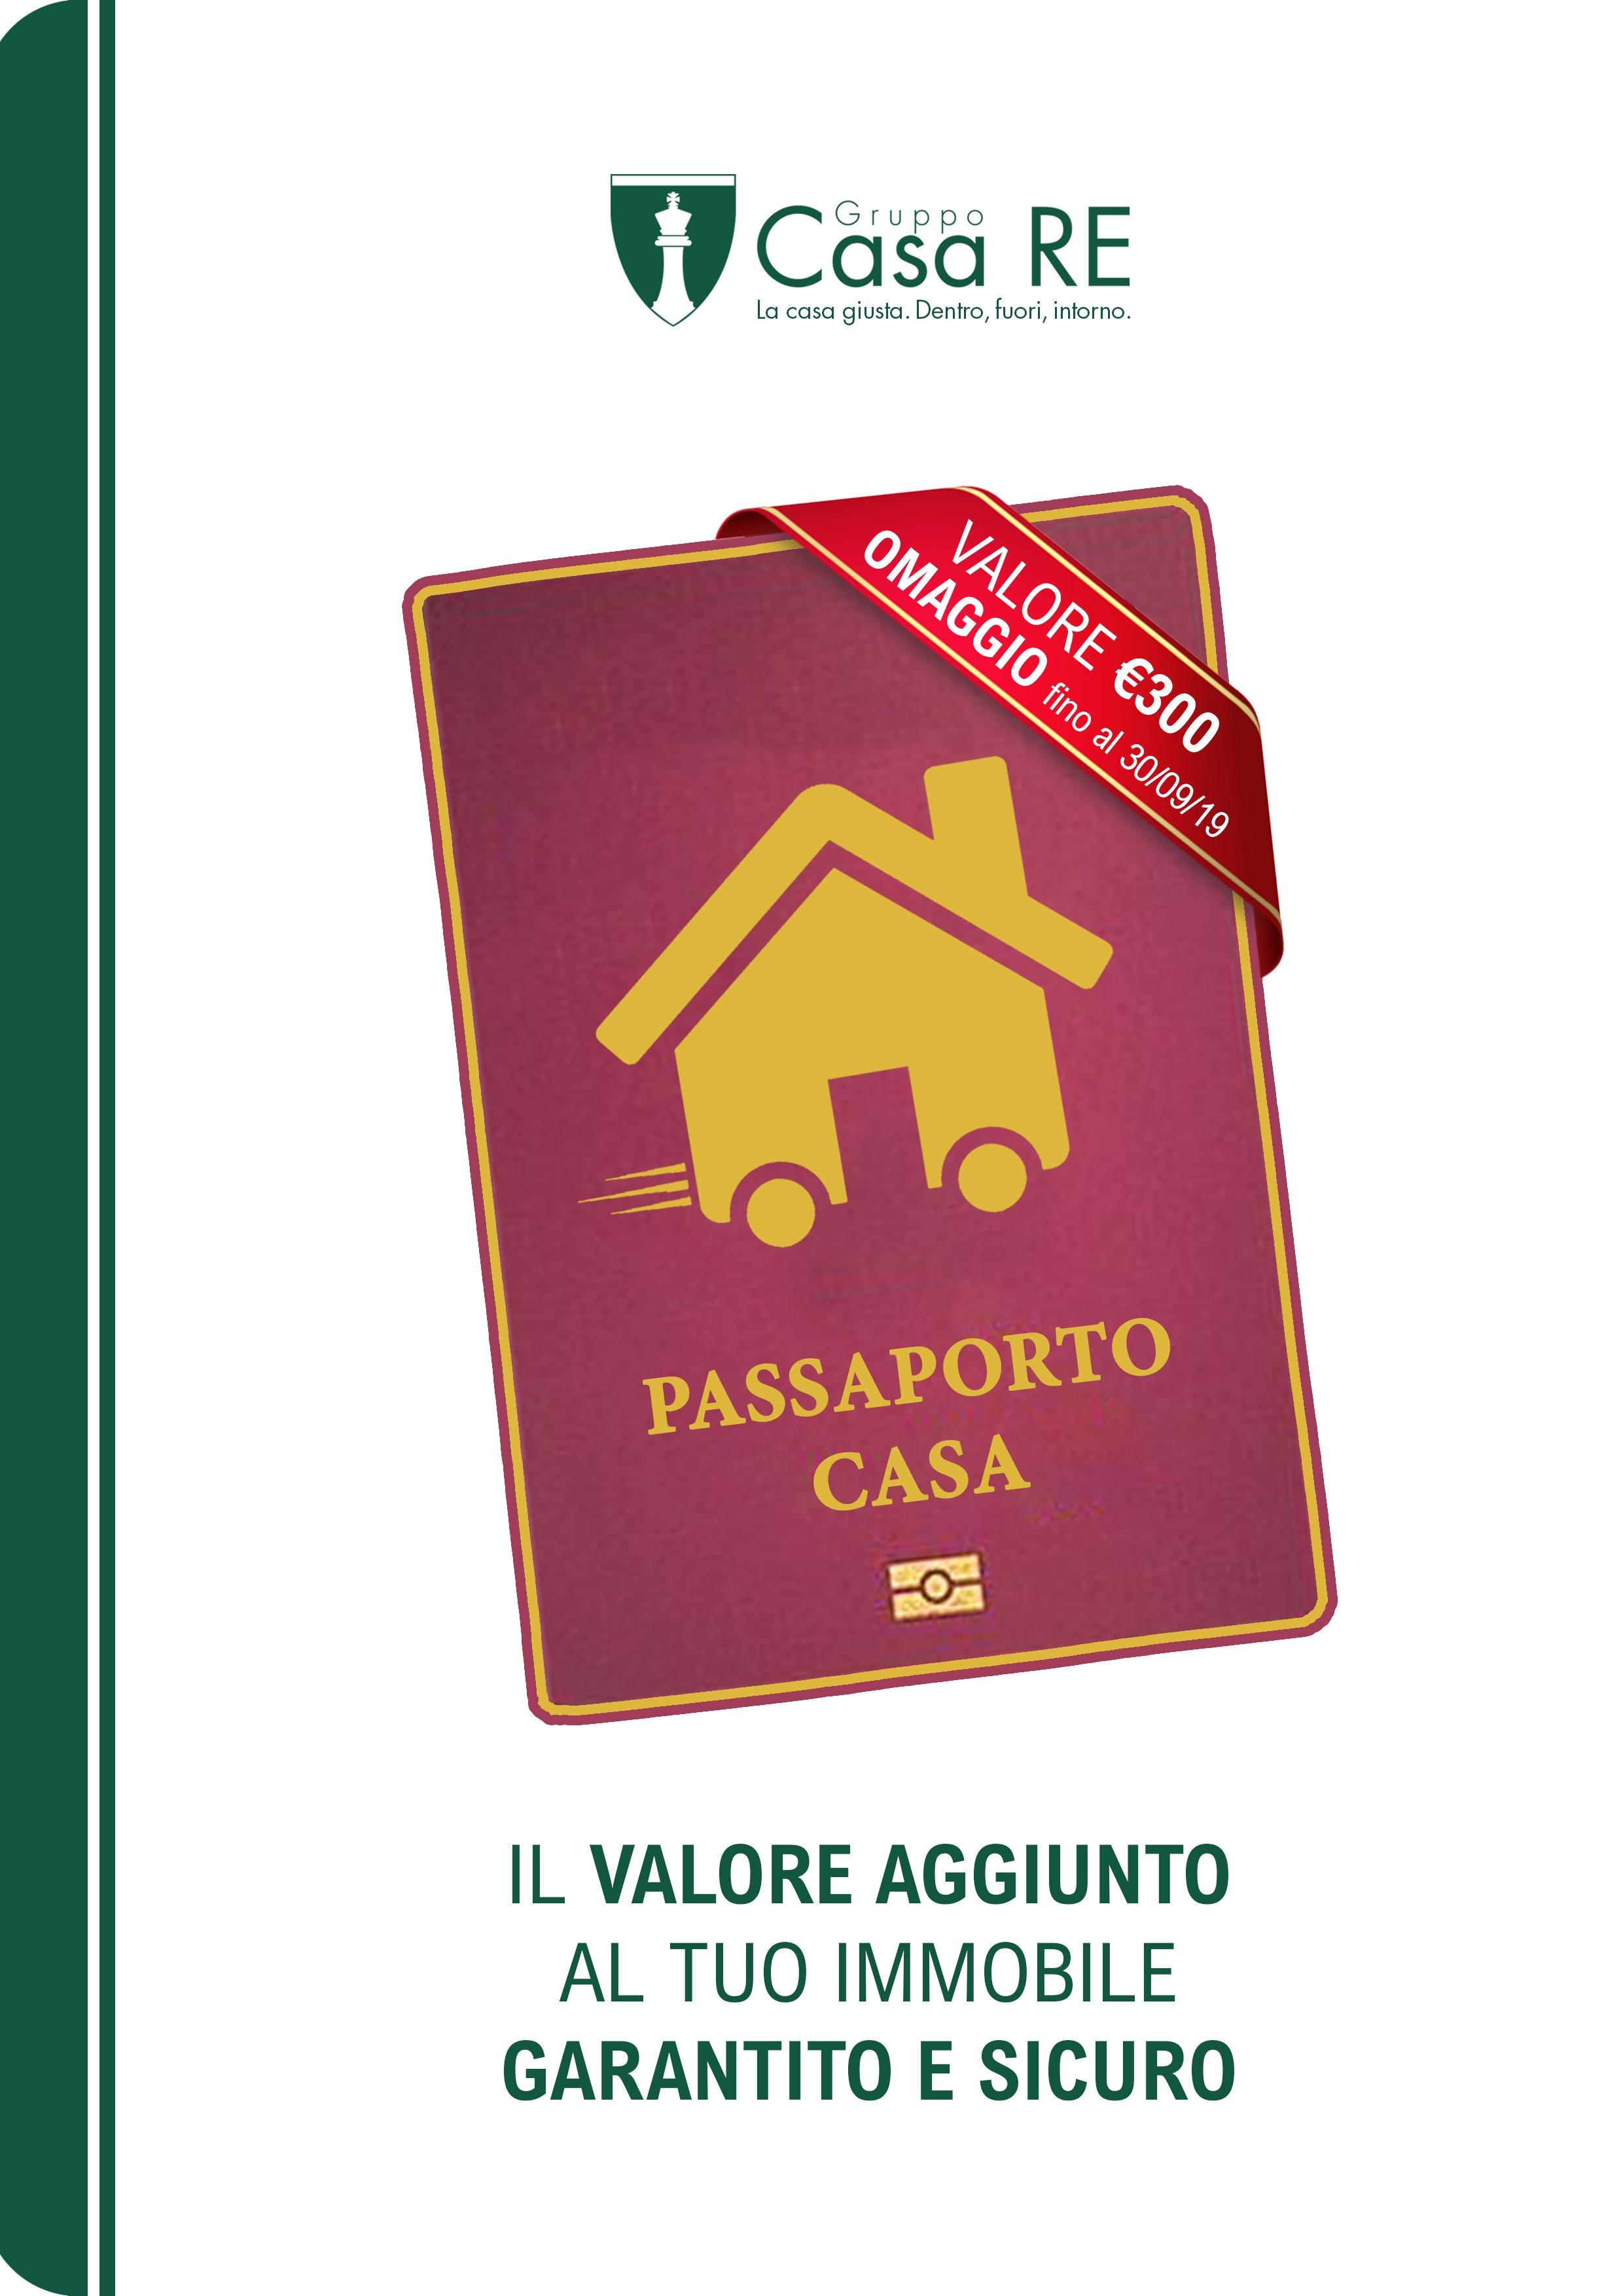 Passaporto Casa